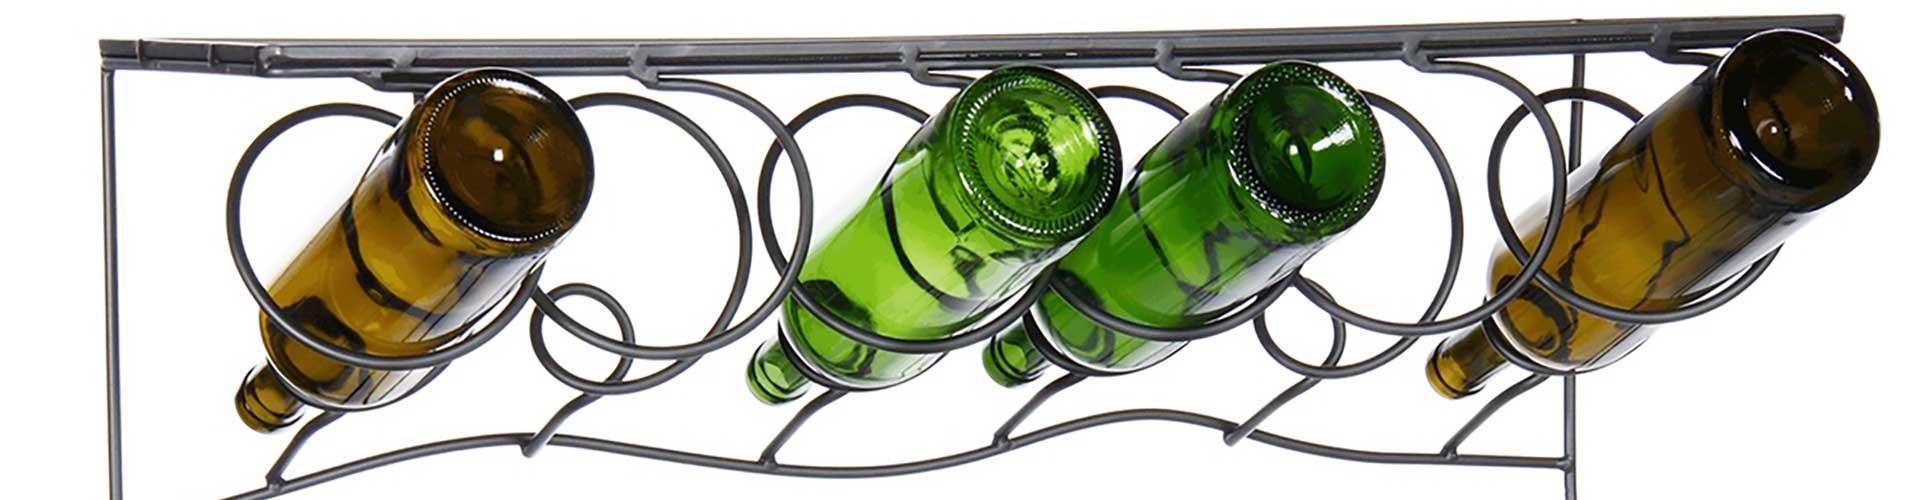 Hanging Metal Wine Bottle Holders